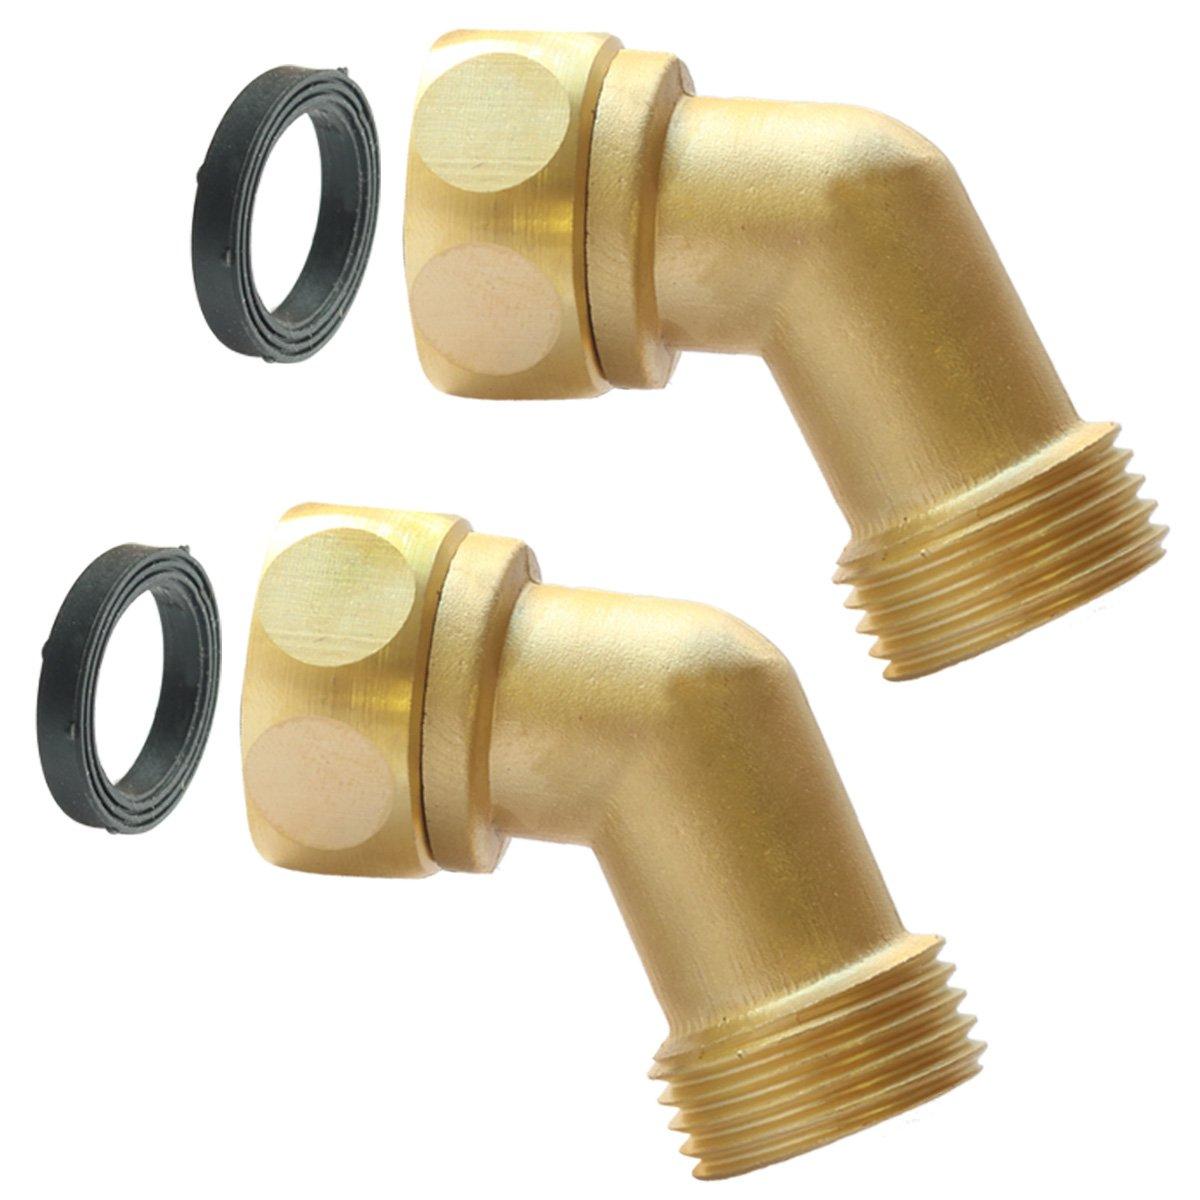 PLG Garden Hose Elbow Connector,45 Degree Hose Extender,Solid Brass Adapter